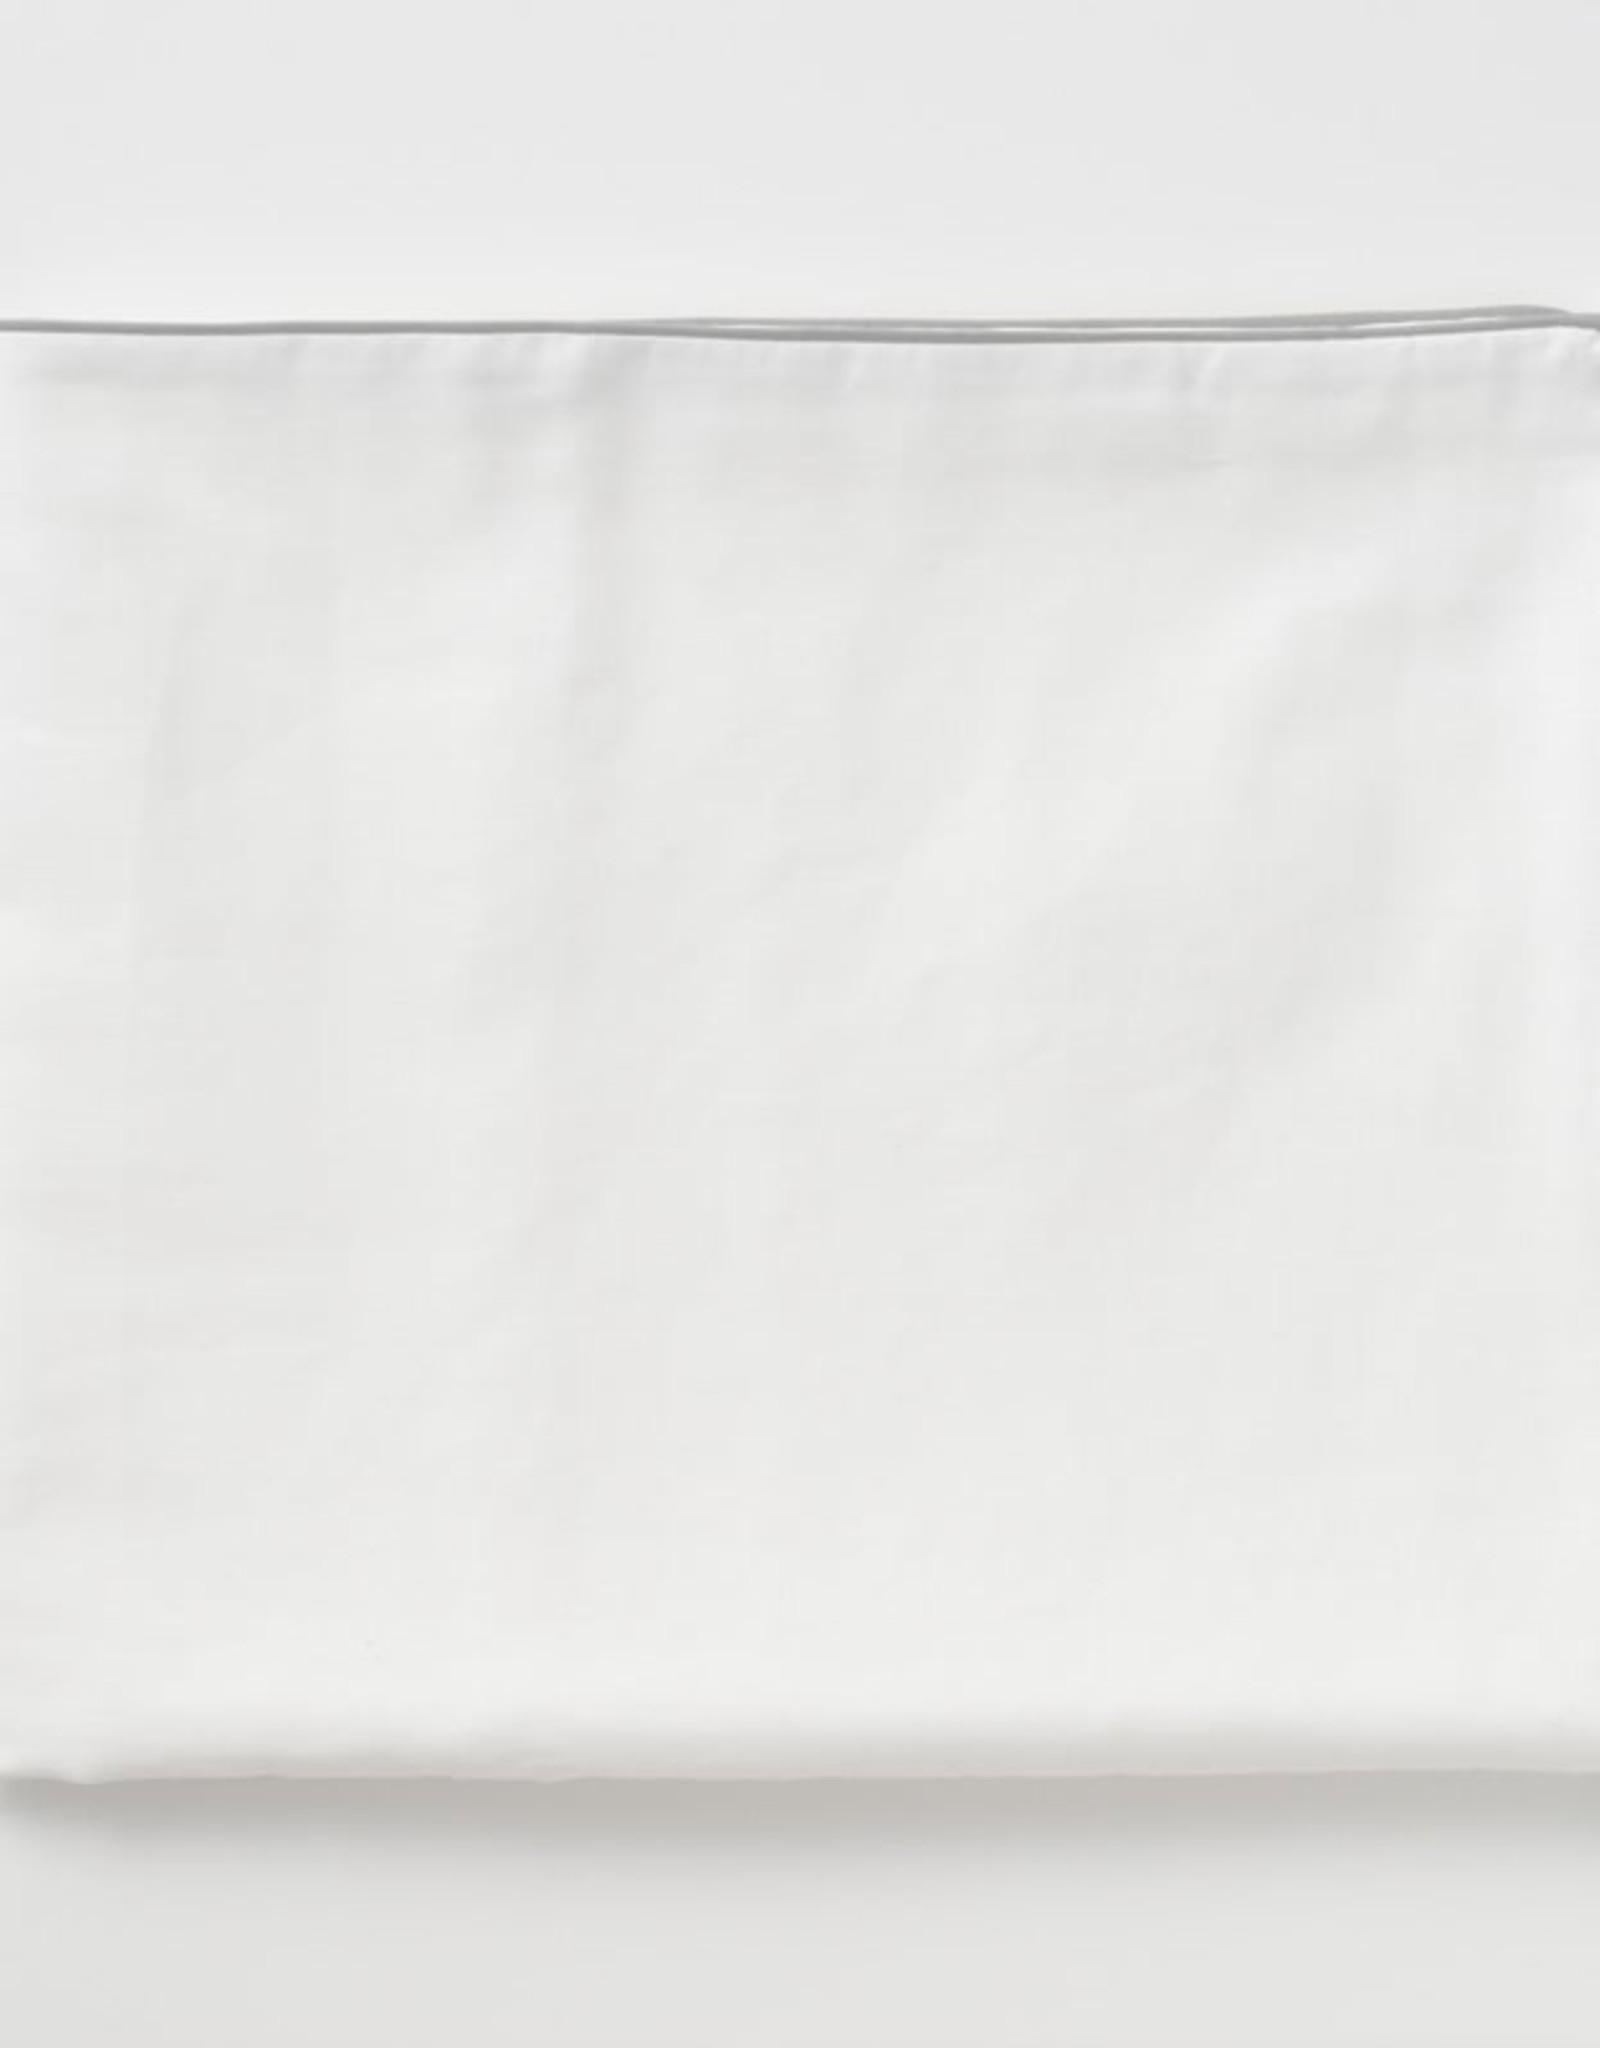 5 Layers Gauze Bath Towels - Grey